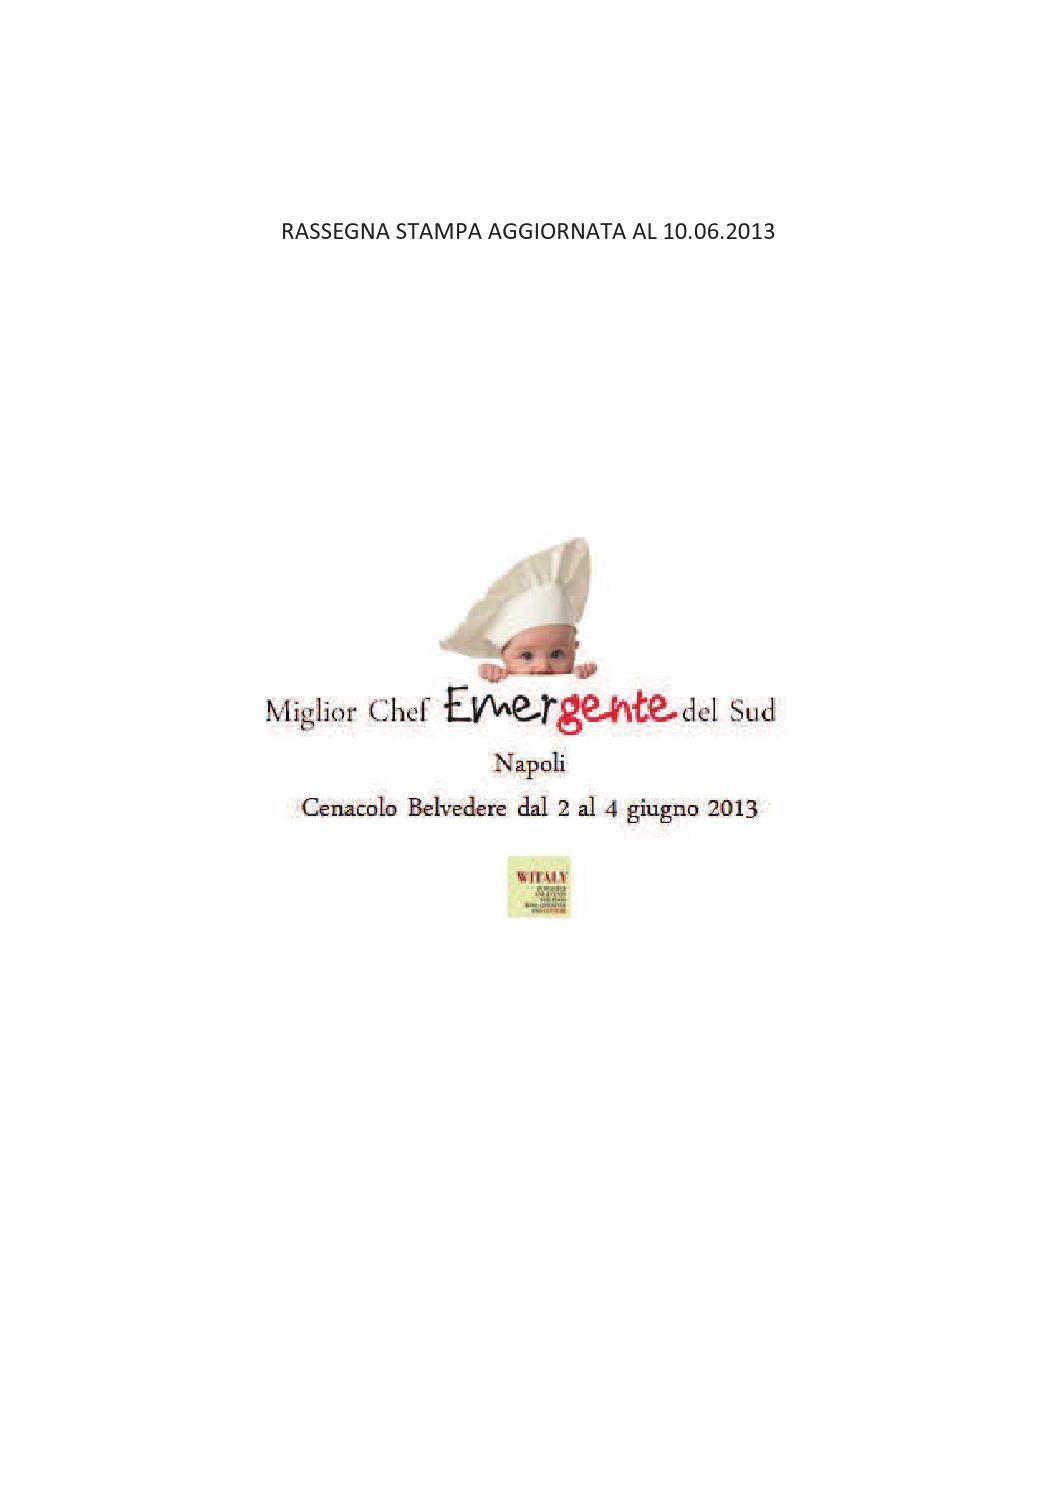 Rassegna Stampa Emergente 2013 By Witaly Lorenza E Luigi Issuu